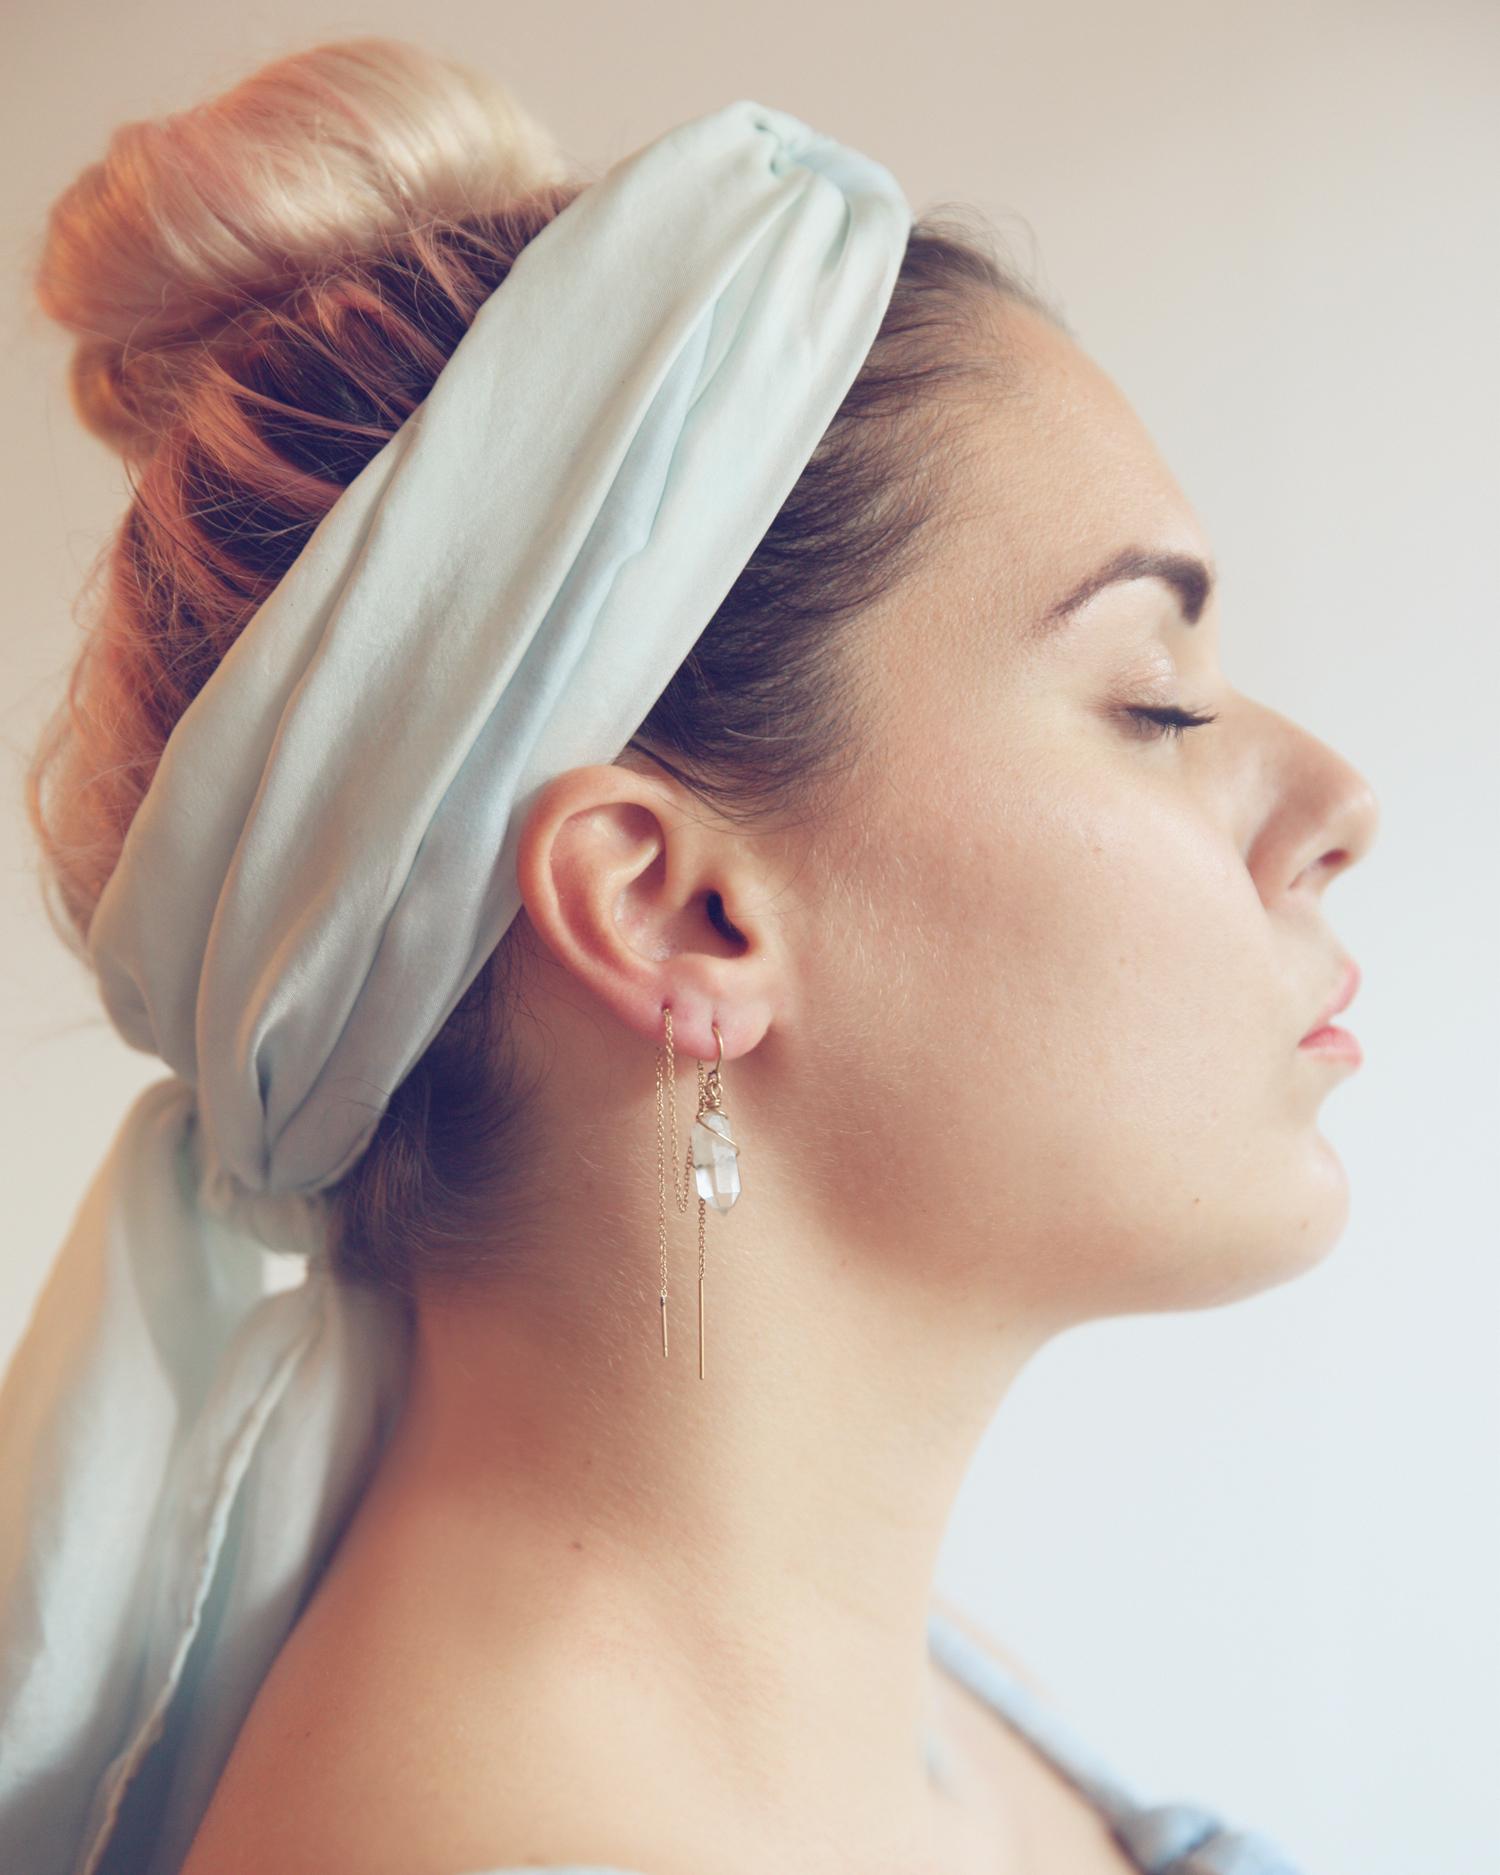 earring03.jpg